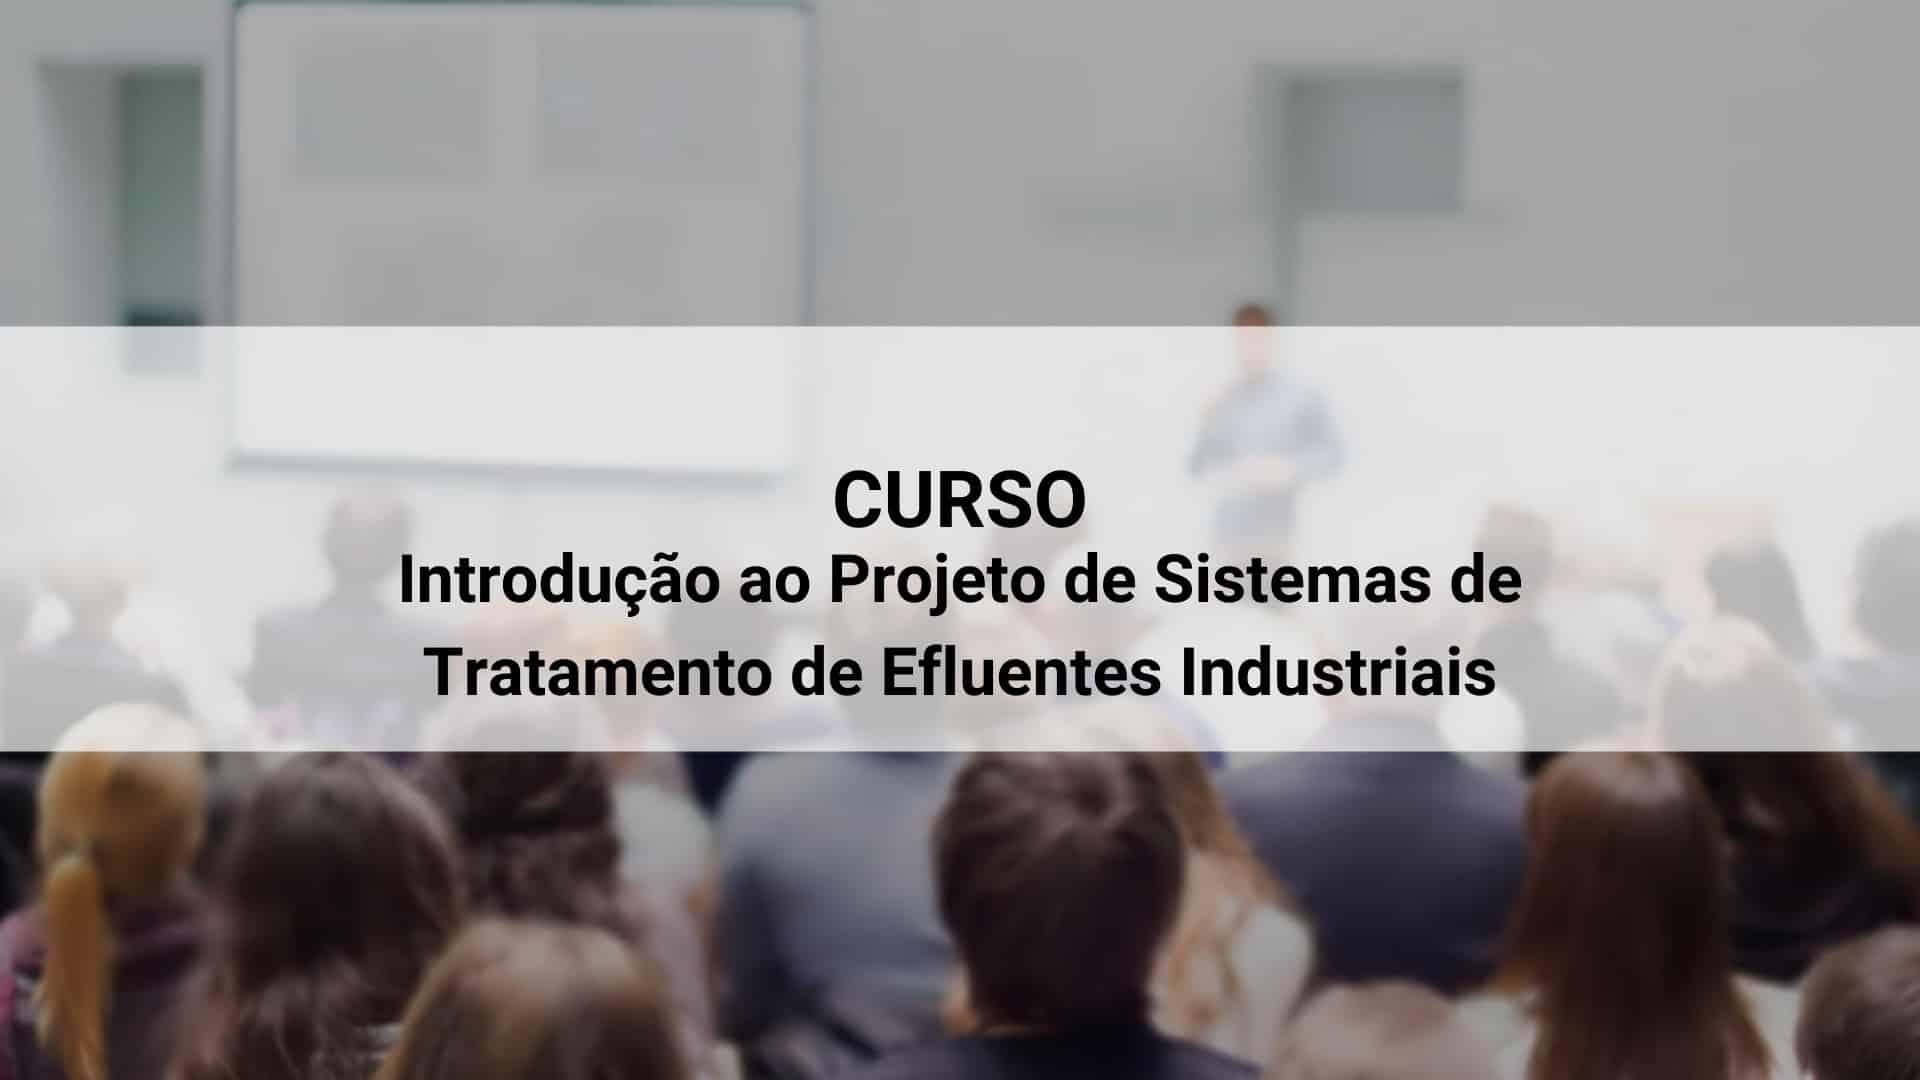 curso introducao ao projeto de sistemas de tratamento de efluentes insdustriais